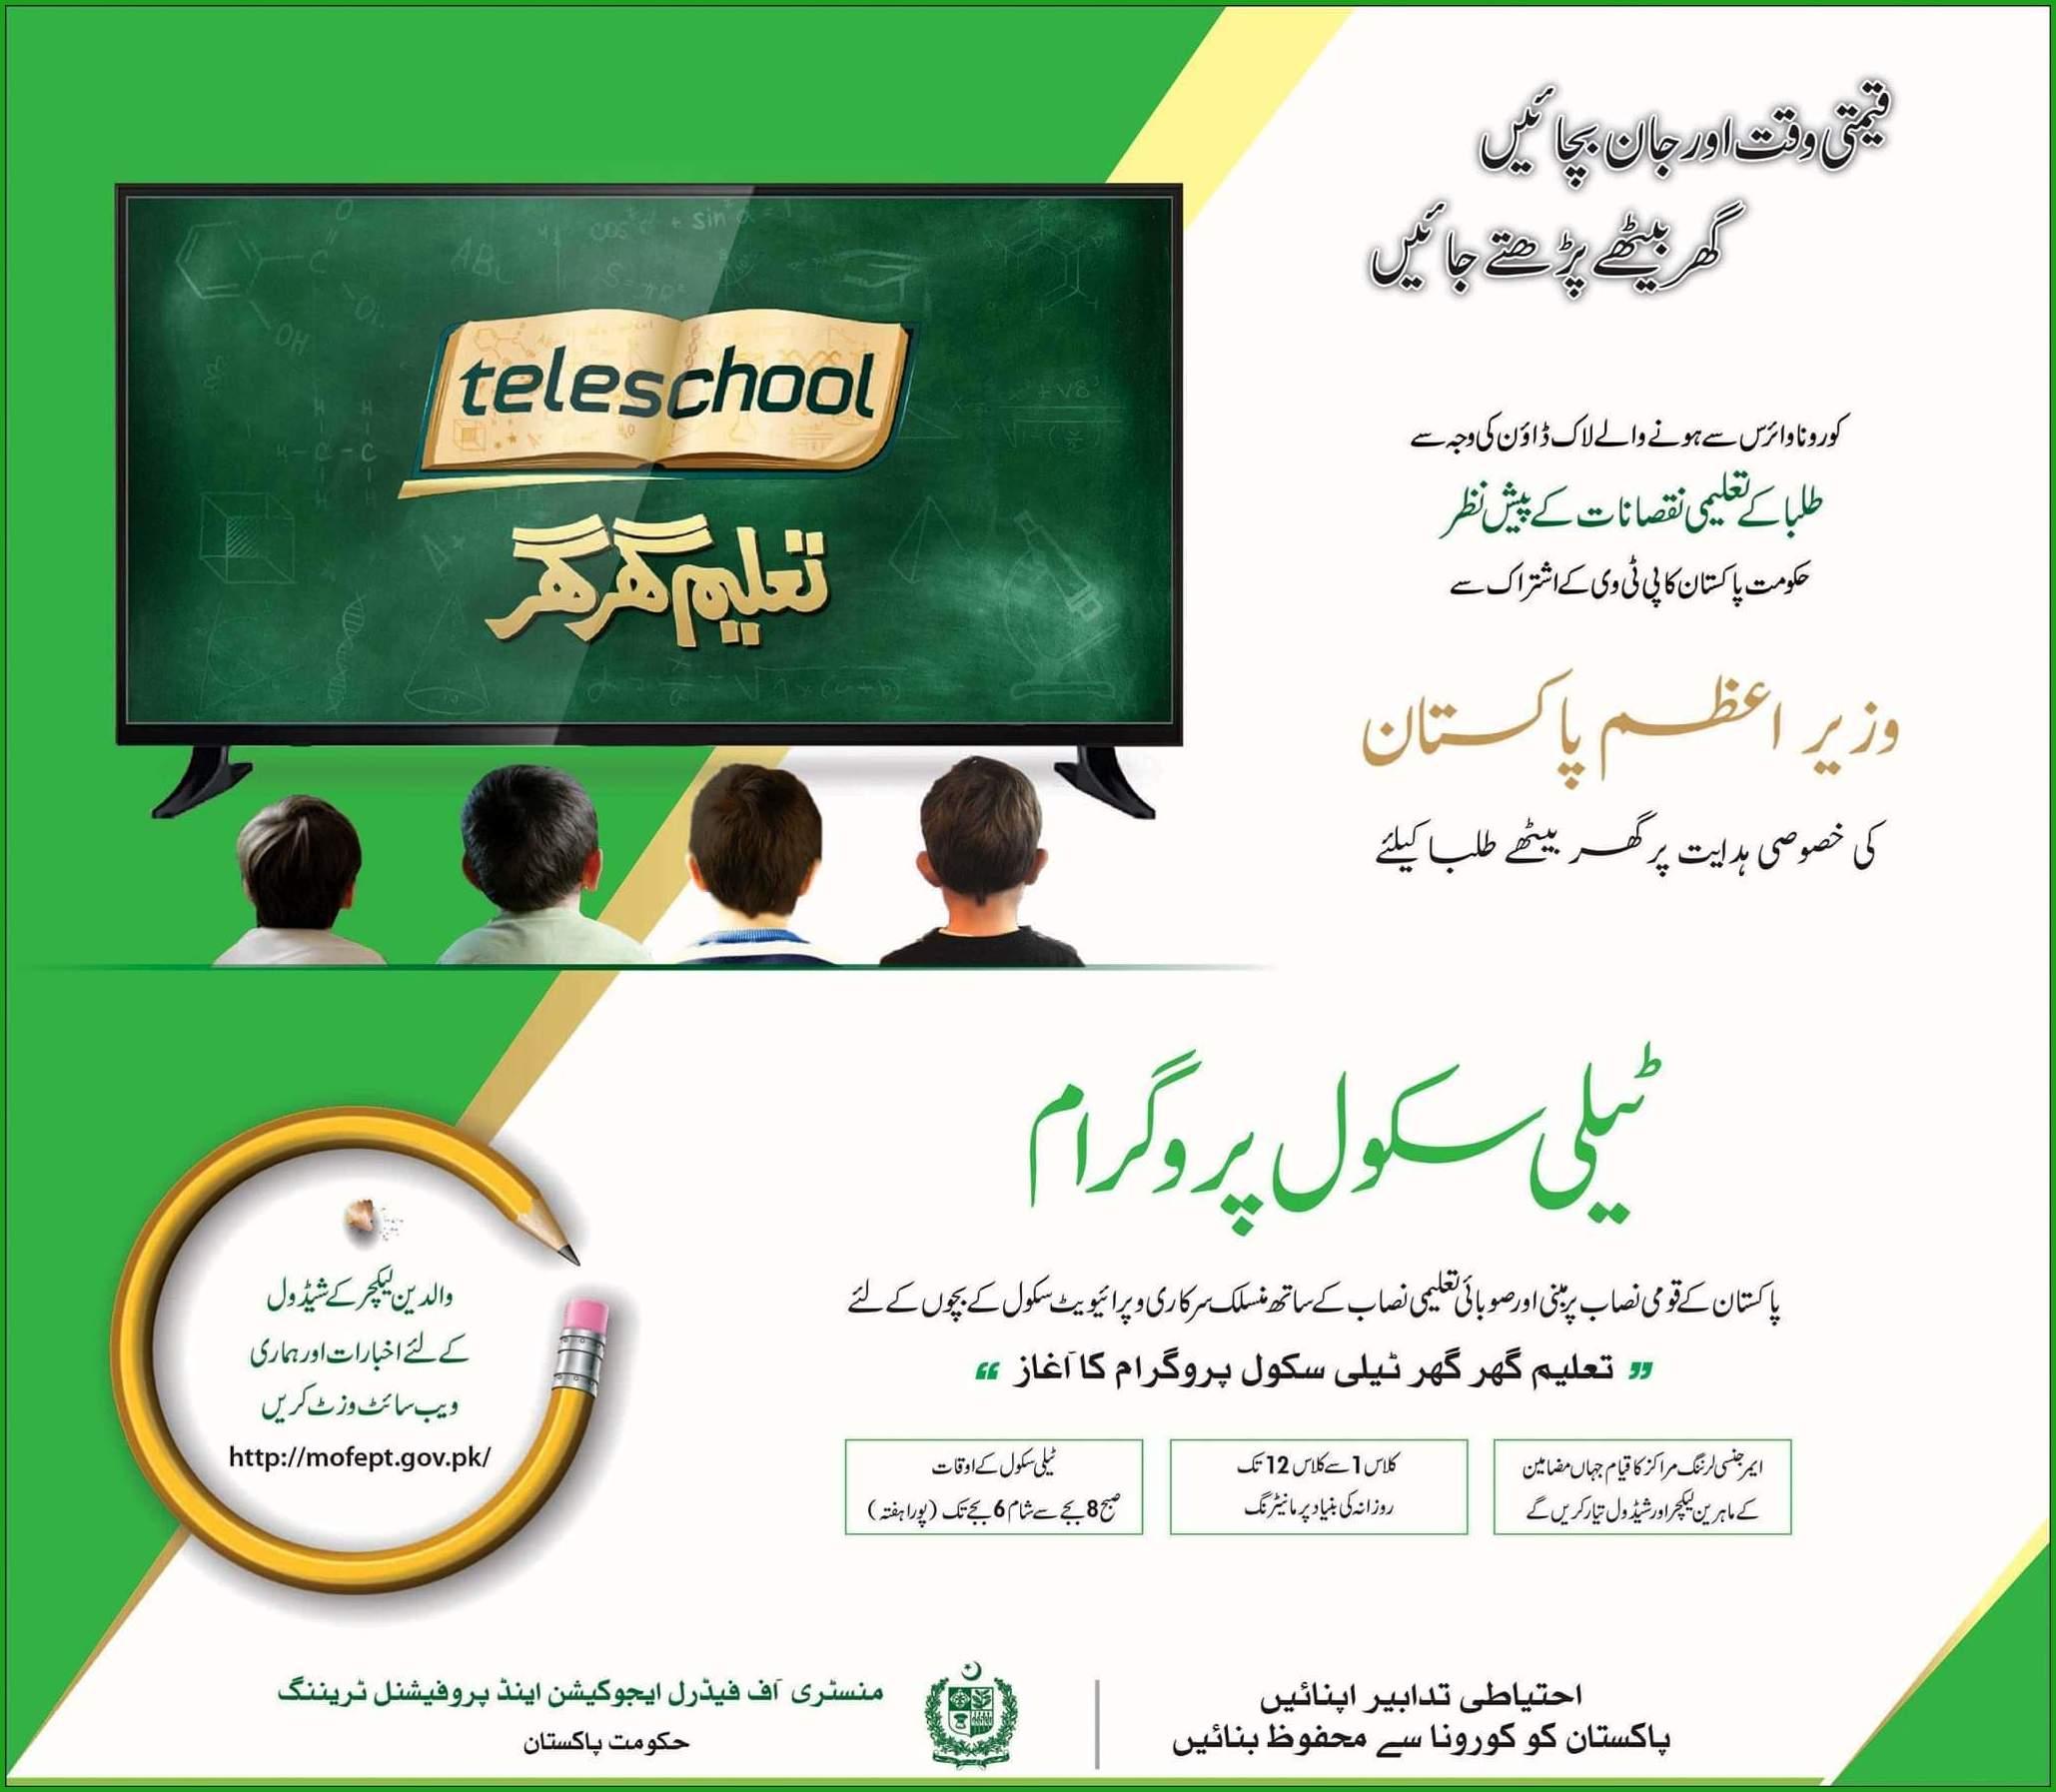 Pakistan Television Network (PTV) Teleschool Programs time table